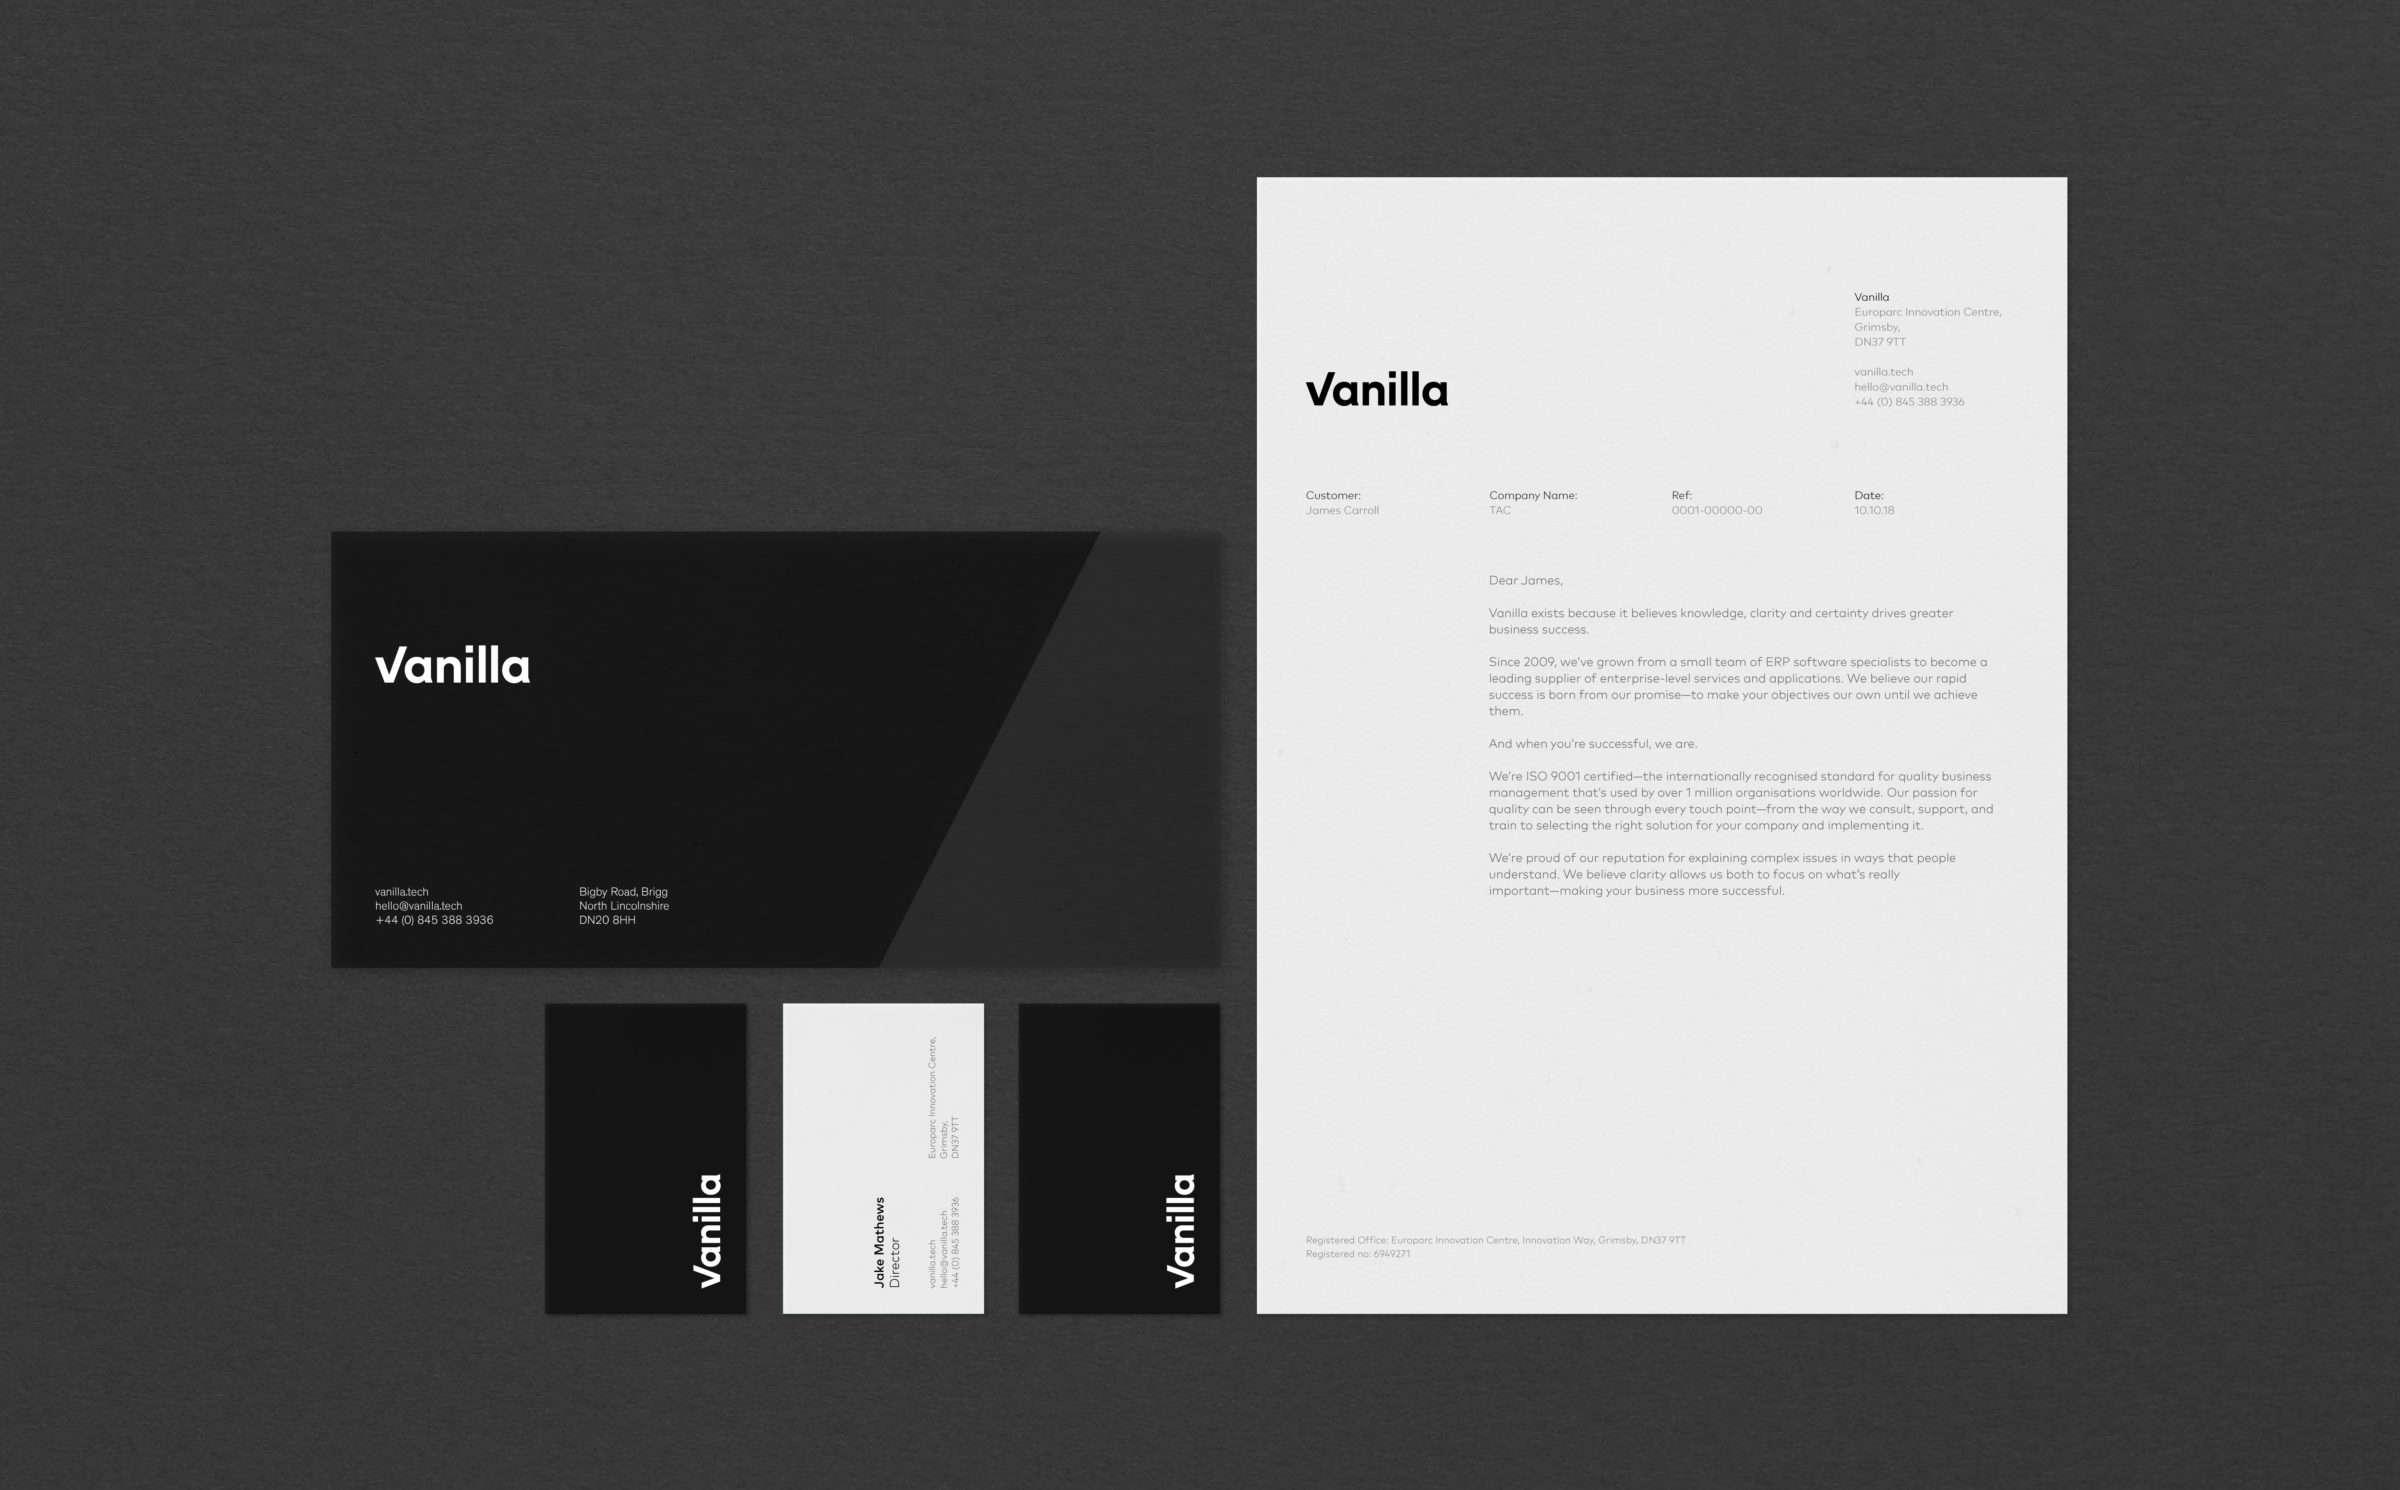 Business stationary design for Vanilla